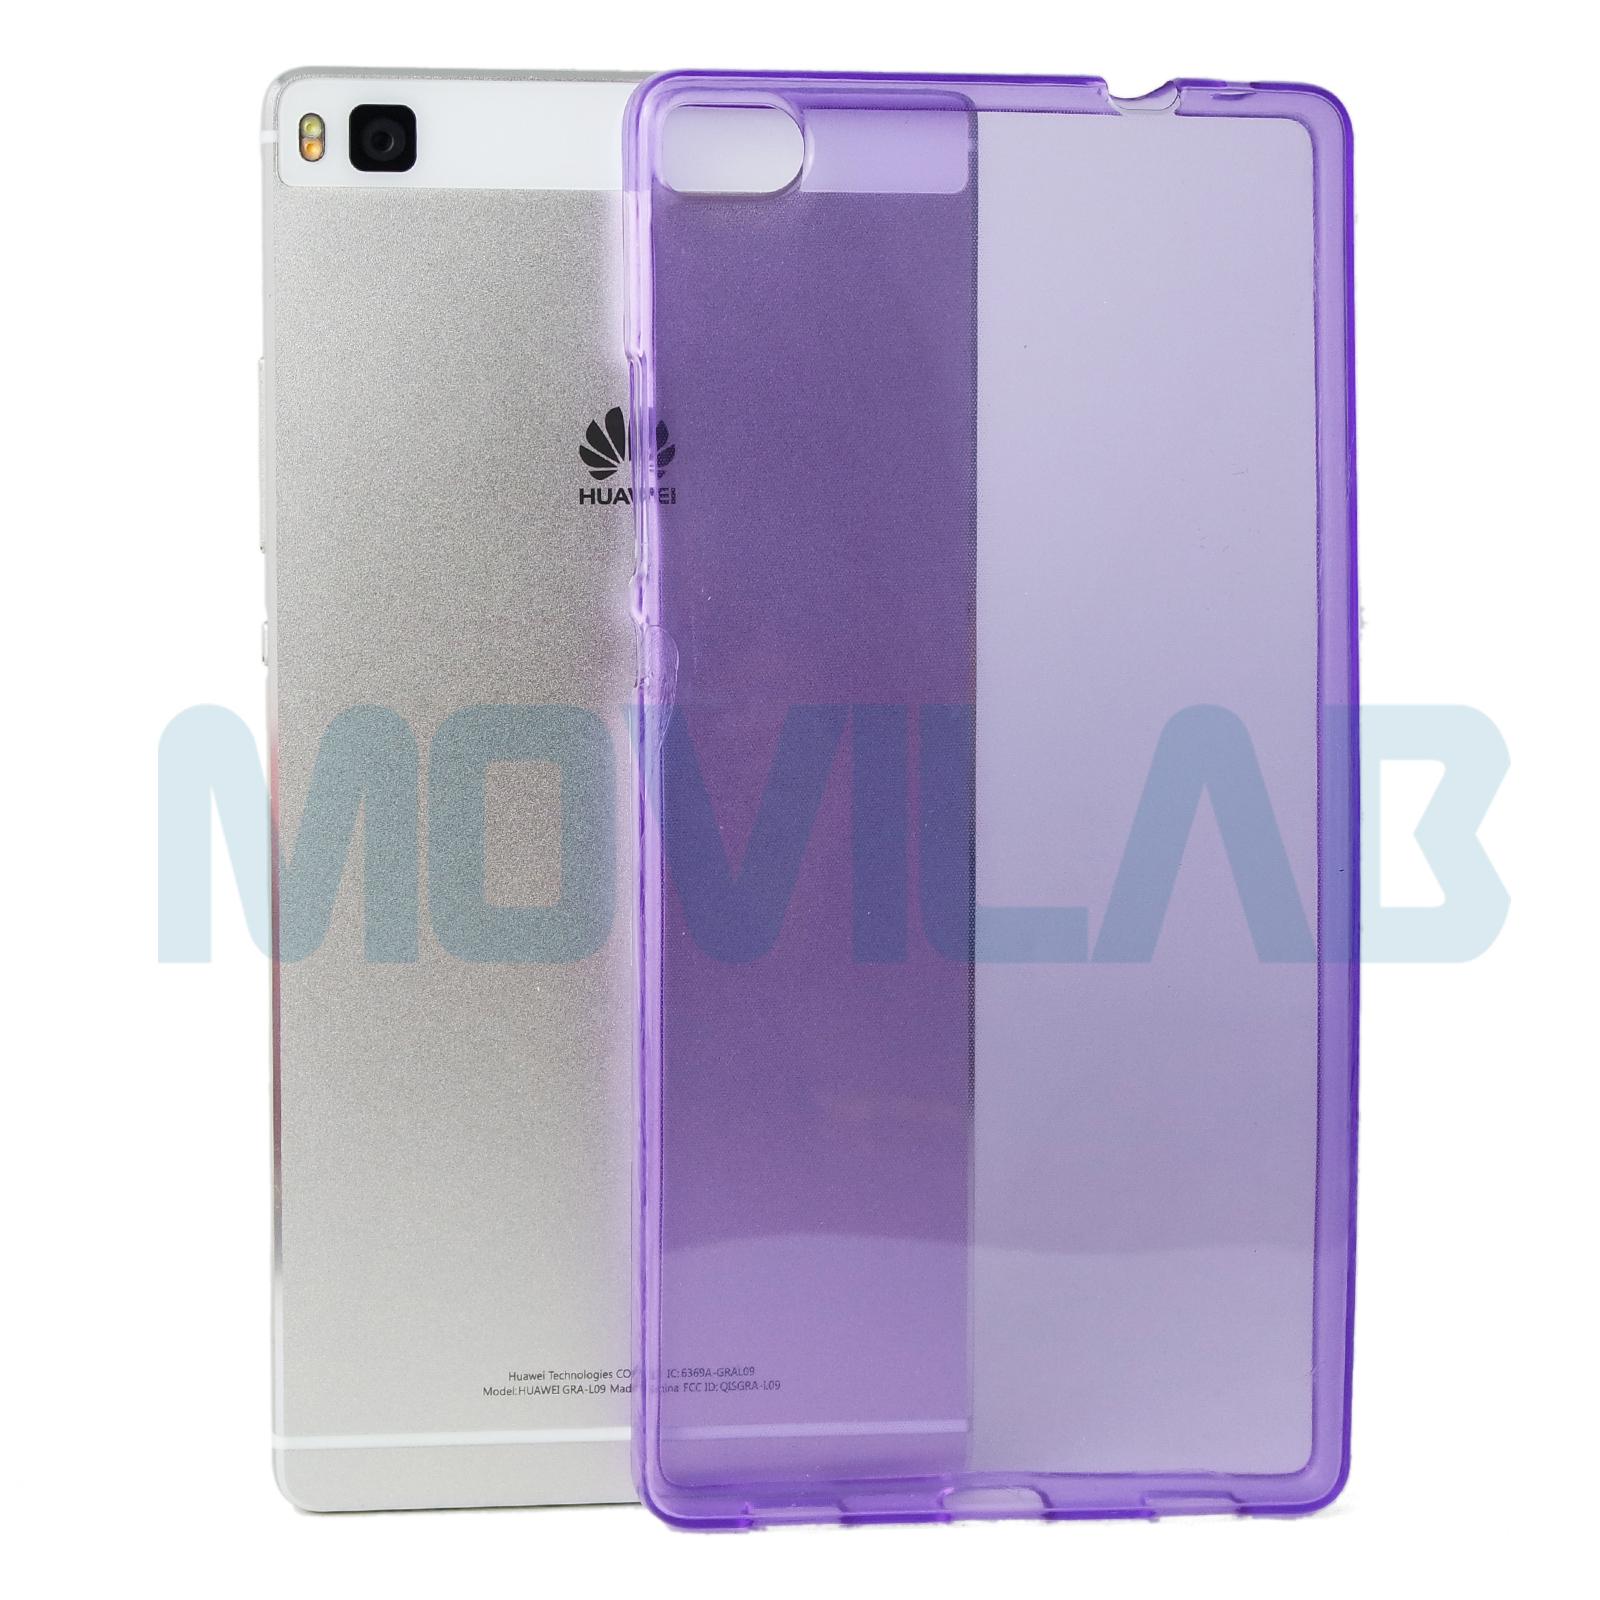 Funda Huawei P8 violeta